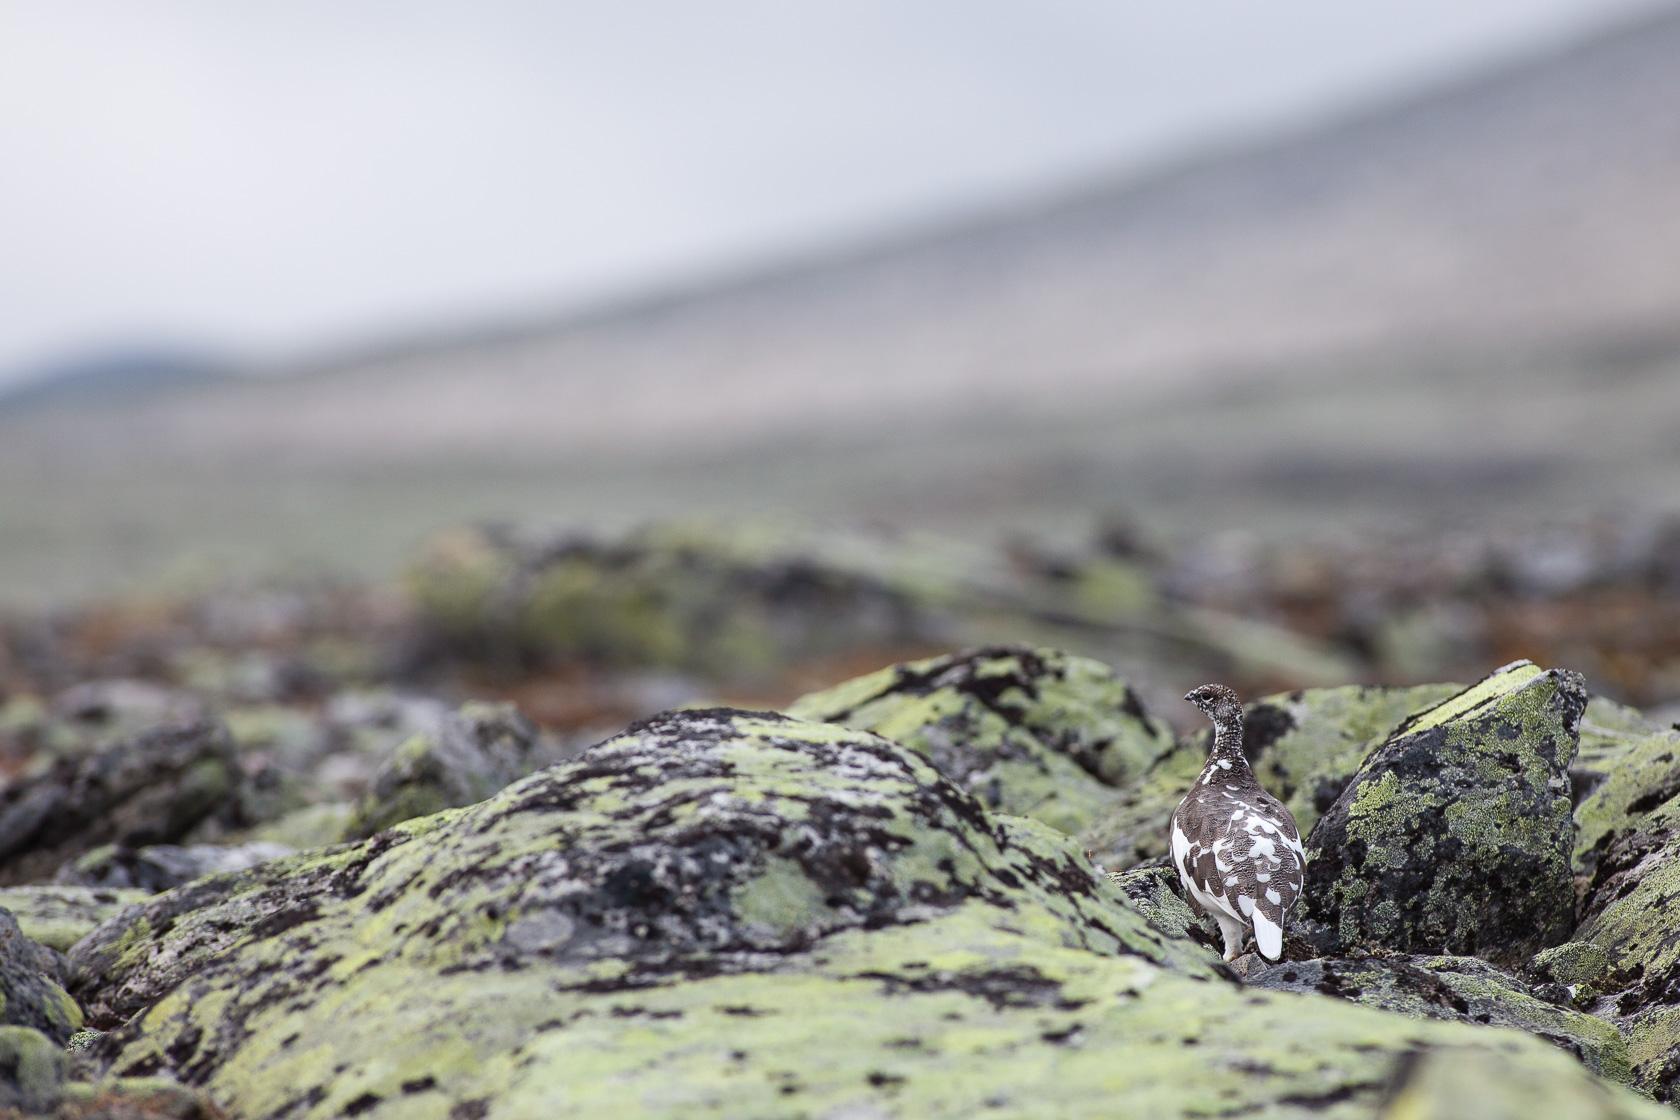 Lagopède alpin (Lagopus muta) femelle dans les rochers du parc national de Dovrefjell en Norvège